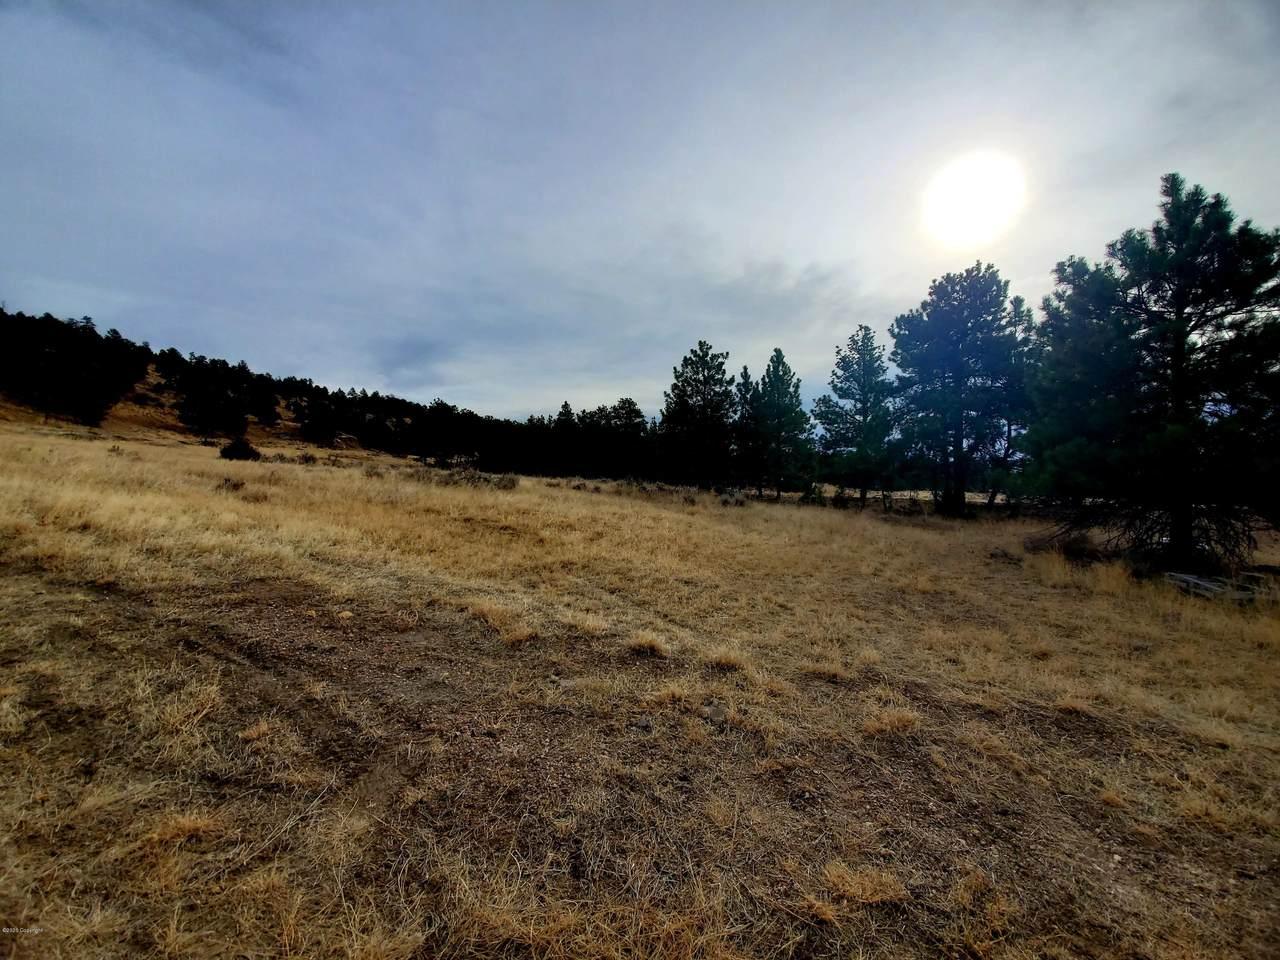 Tbd Hwy 16 20.35 Acres - Photo 1